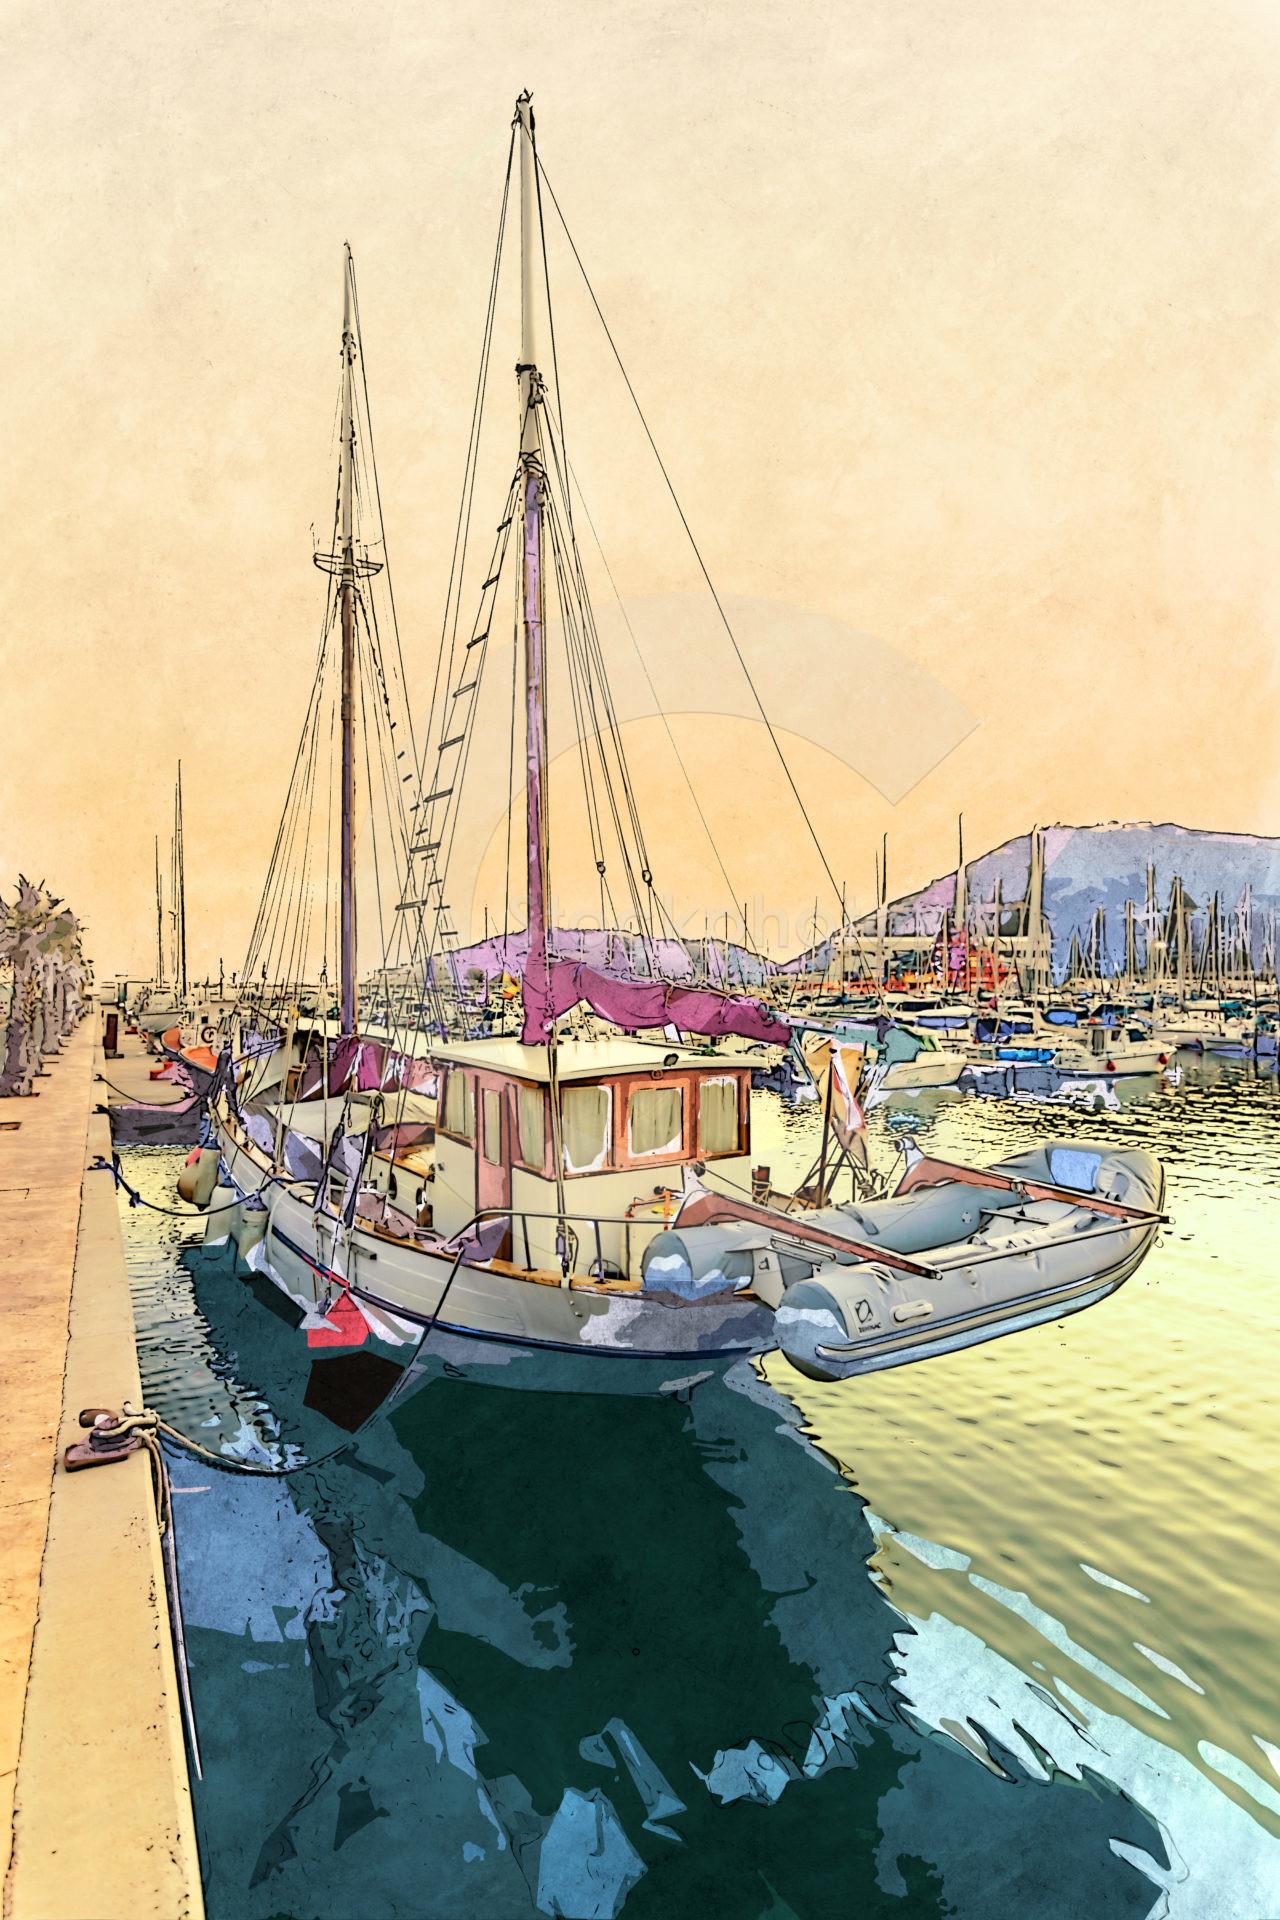 The port of Cartagena